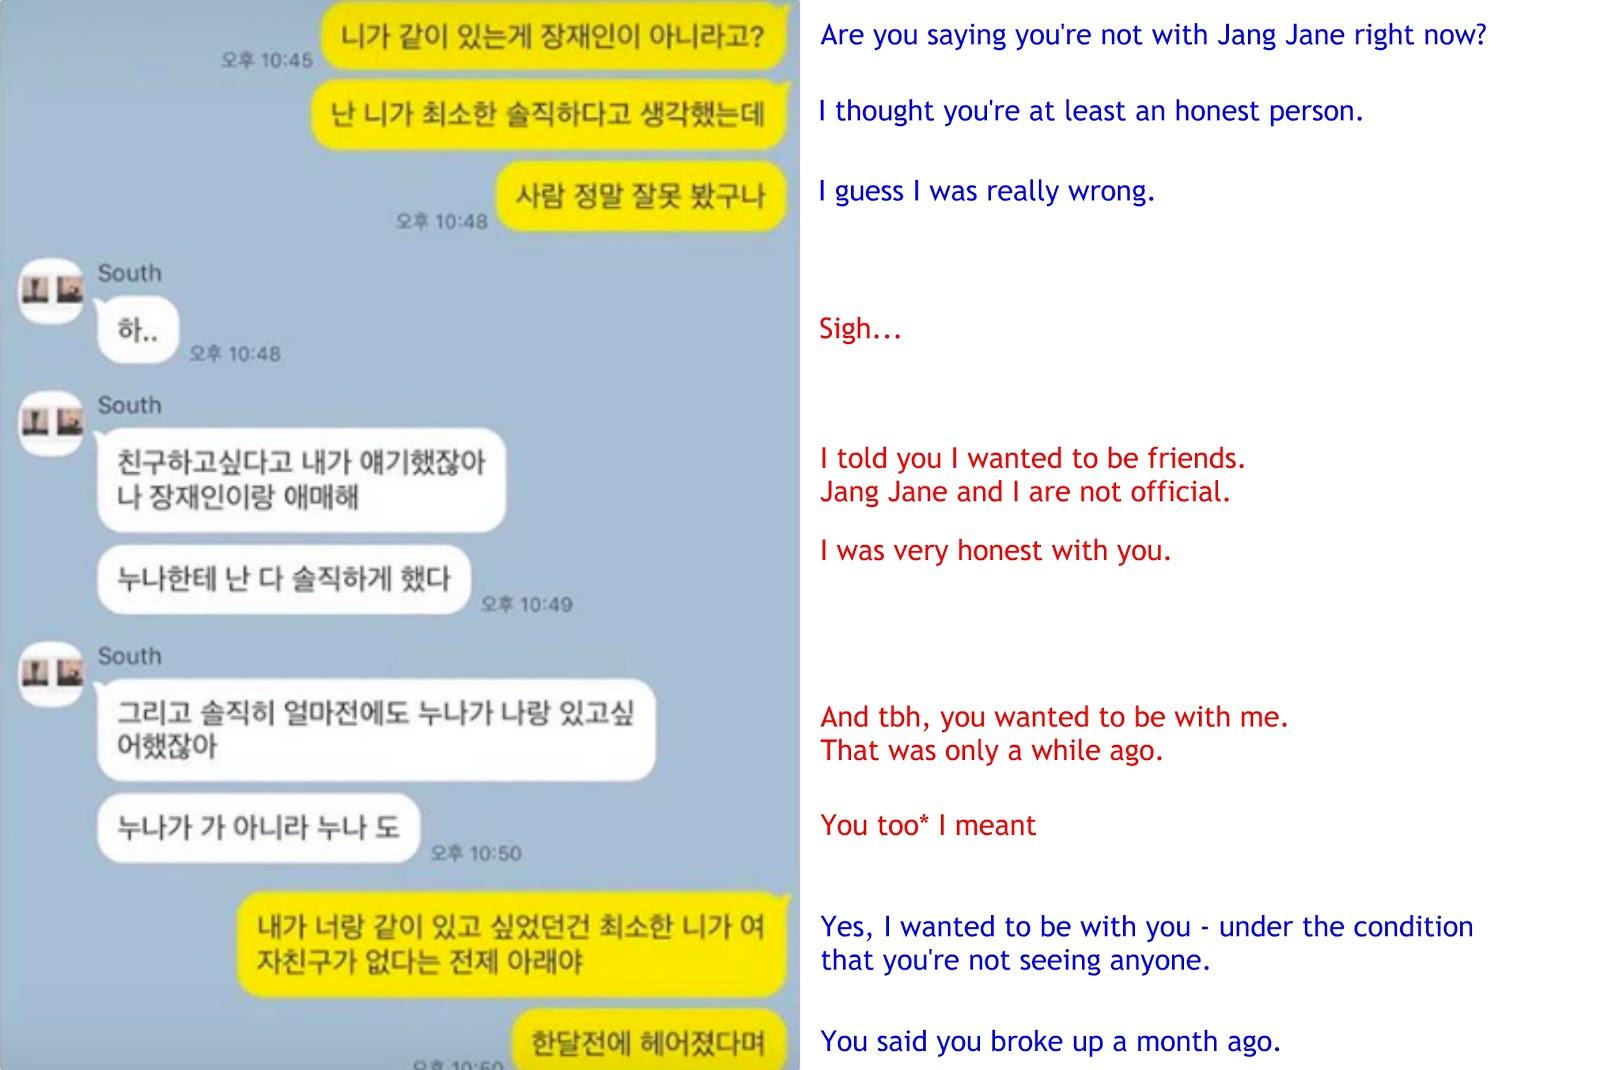 Nam taehyun katalk messages 2